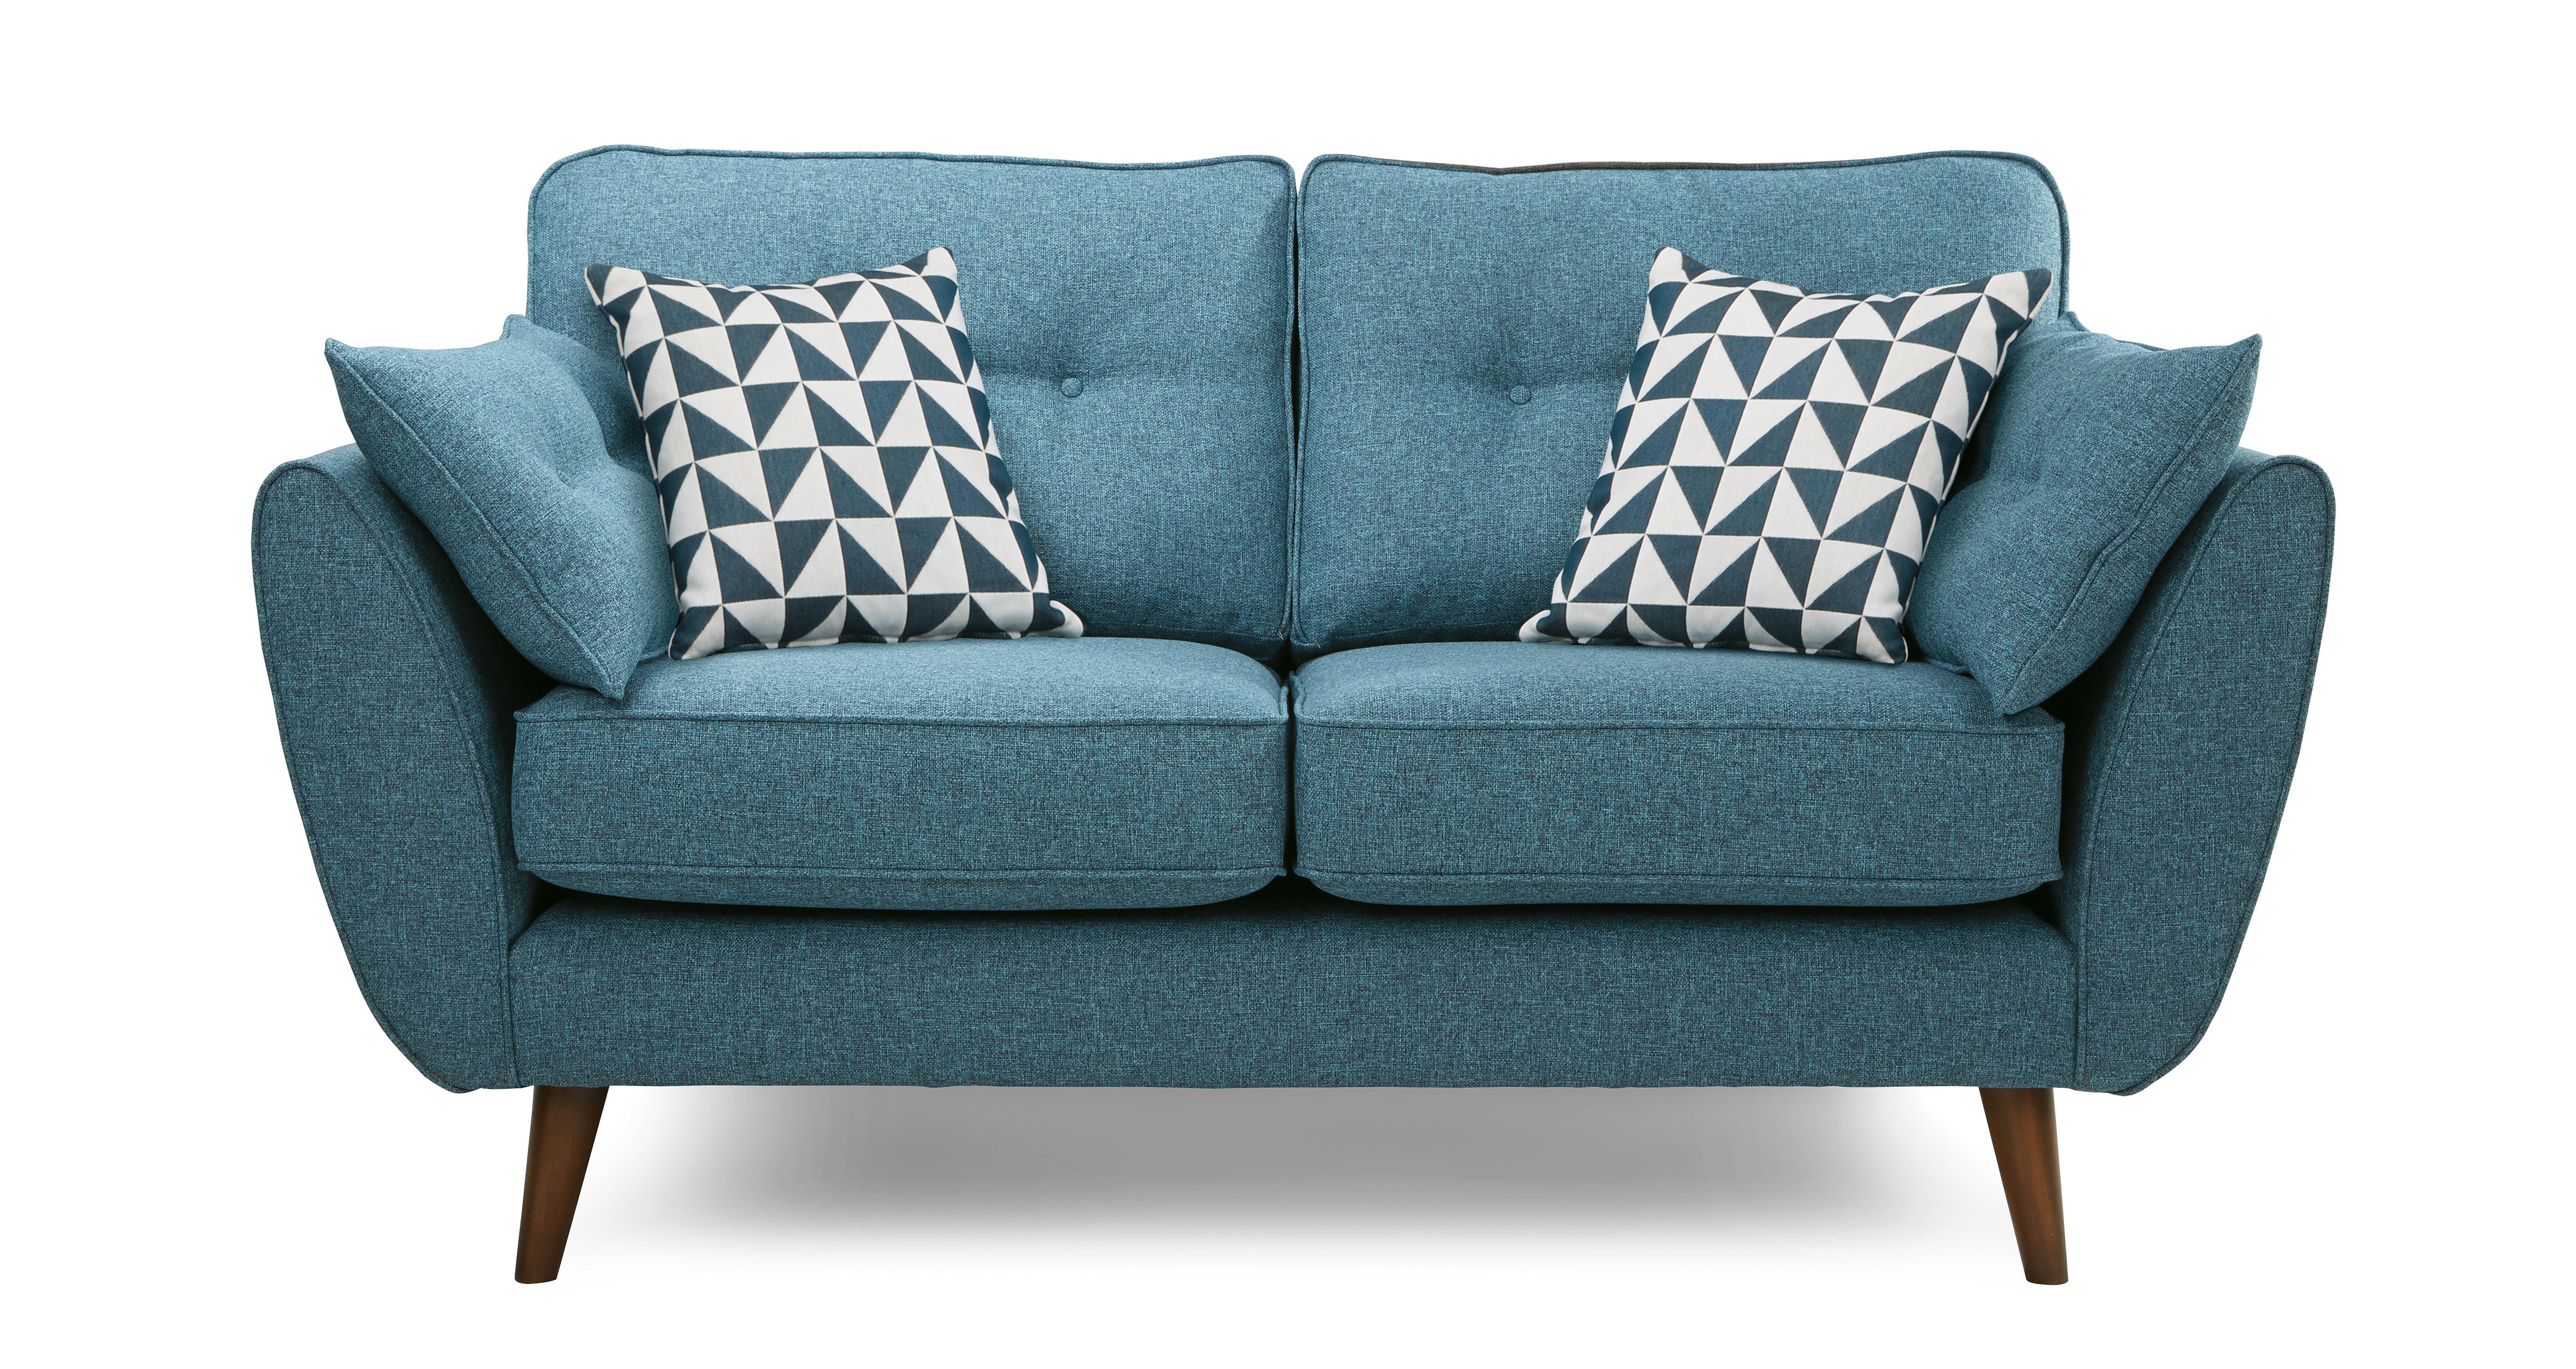 zinc express 2 seater sofa dfs. Black Bedroom Furniture Sets. Home Design Ideas